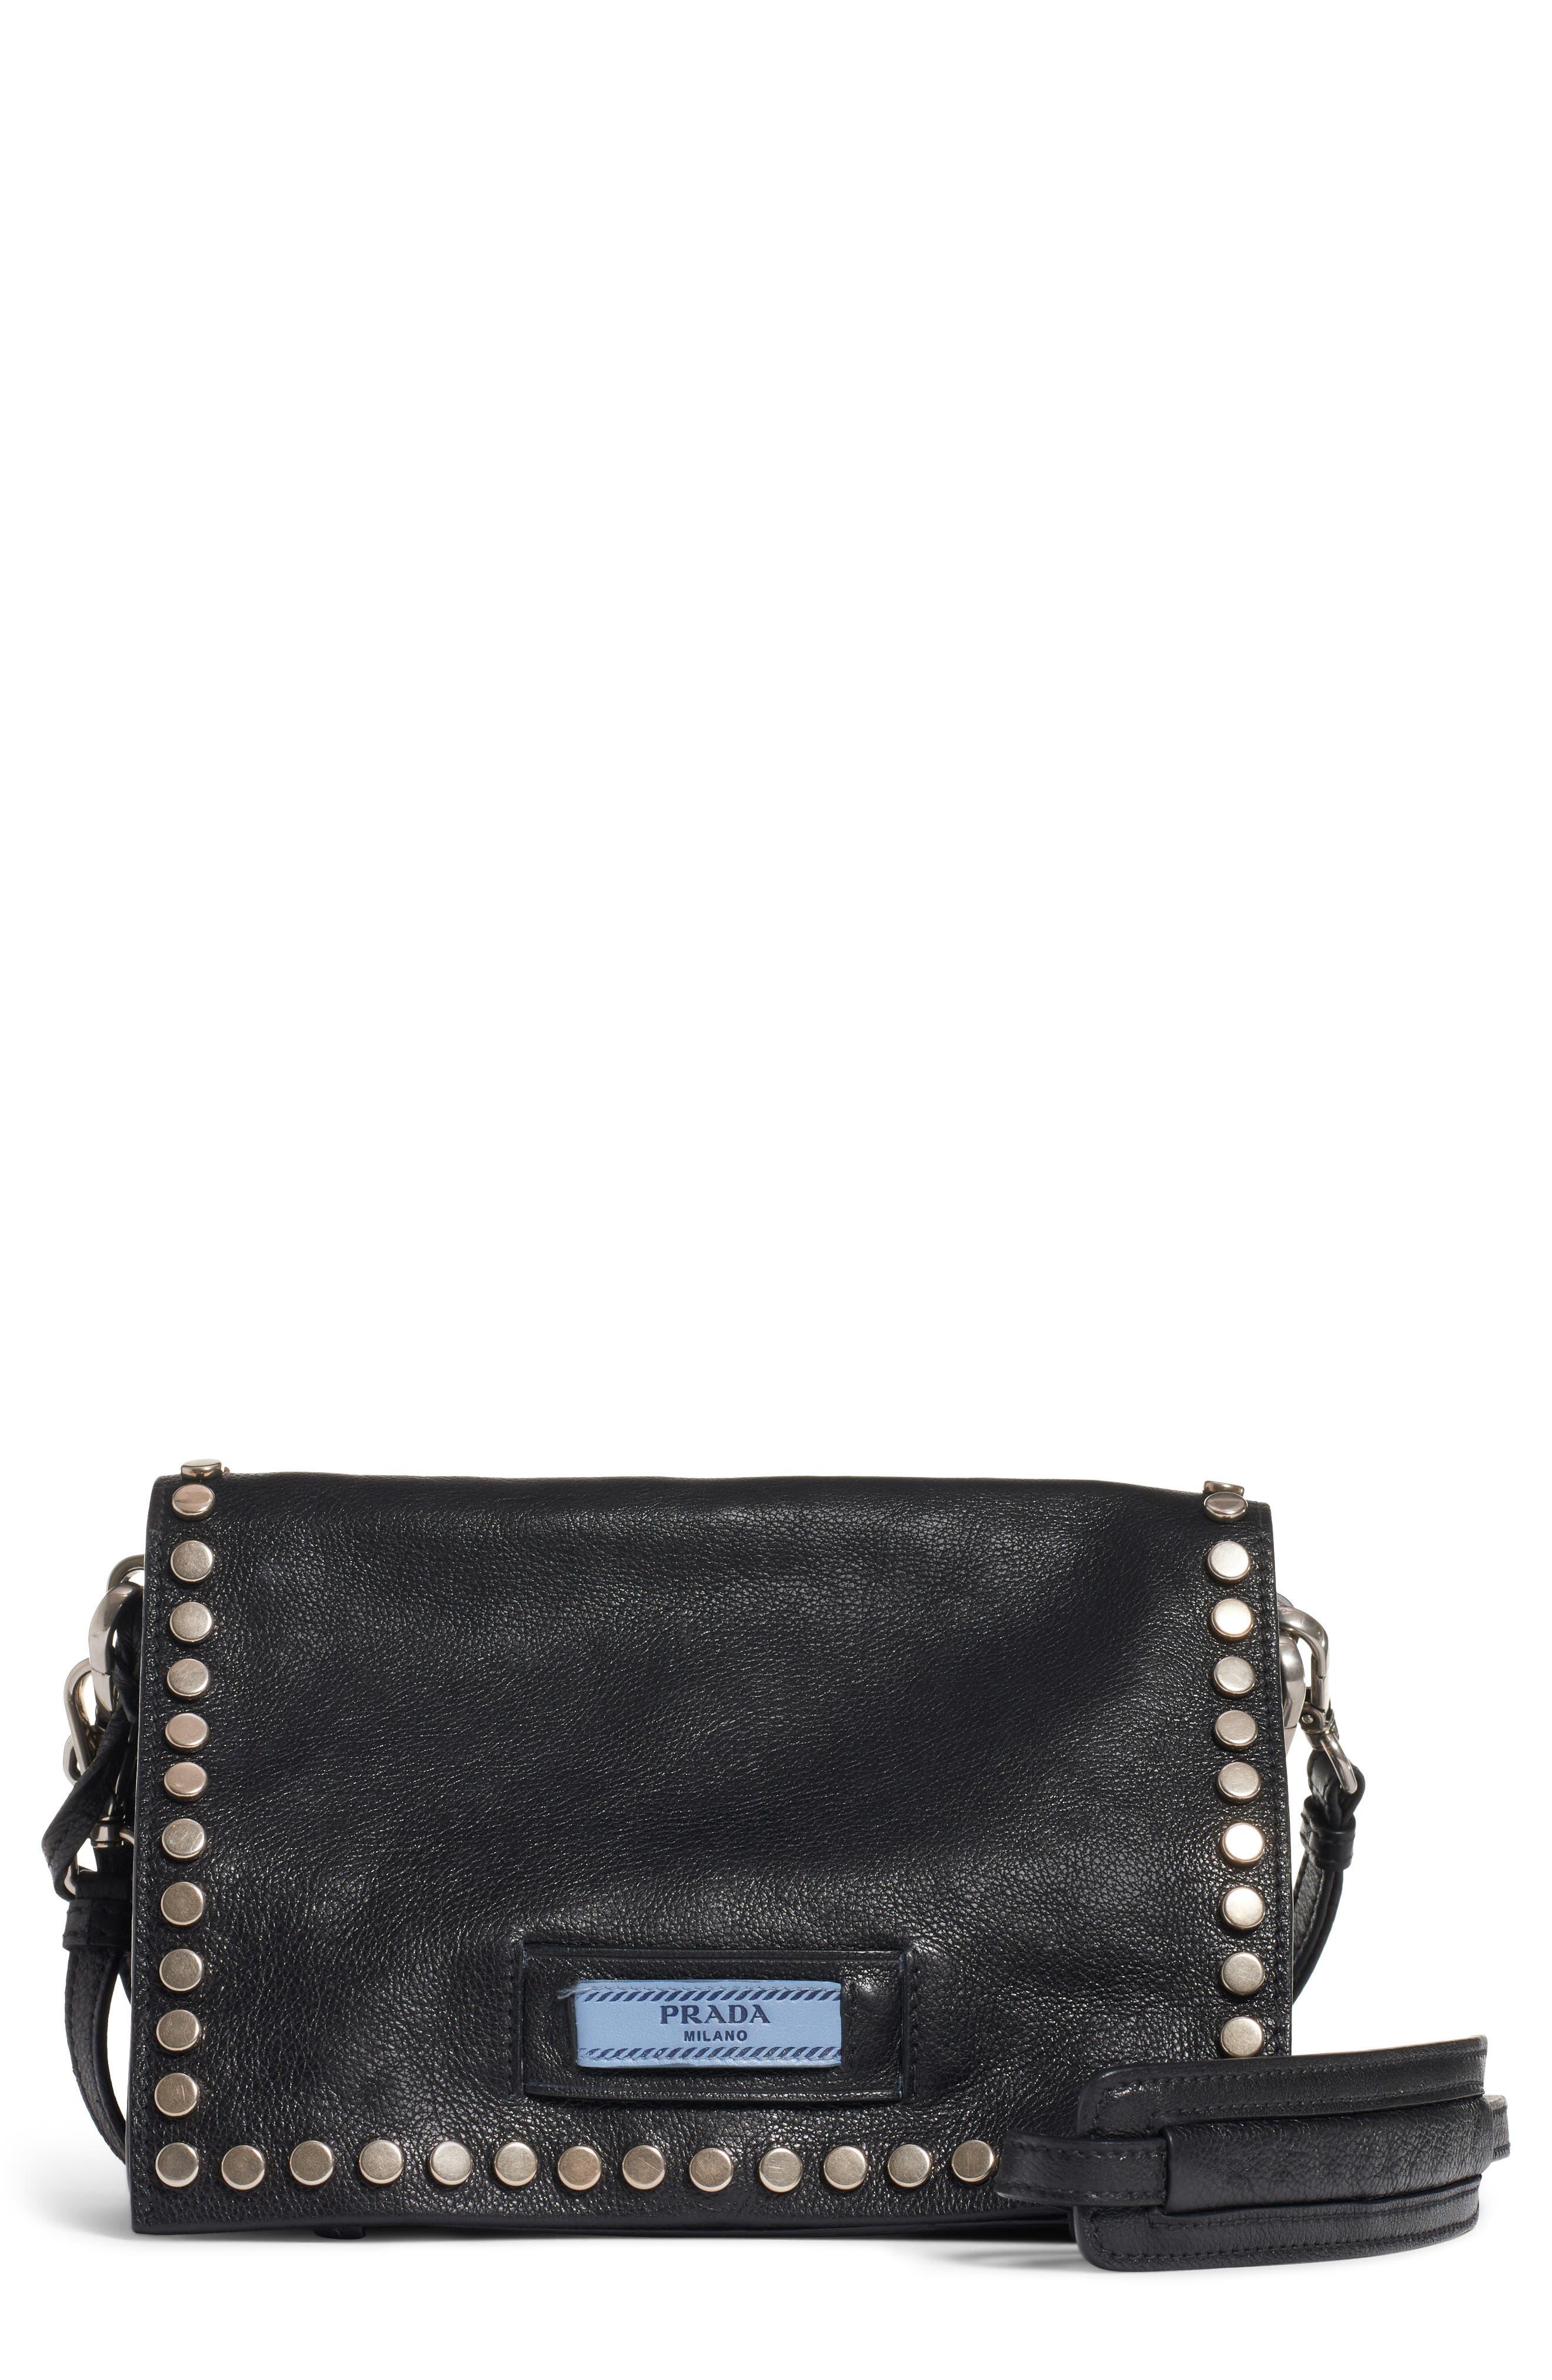 PRADA, Small Stud Etiquette Shoulder Bag, Main thumbnail 1, color, NERO/ ASTRALE